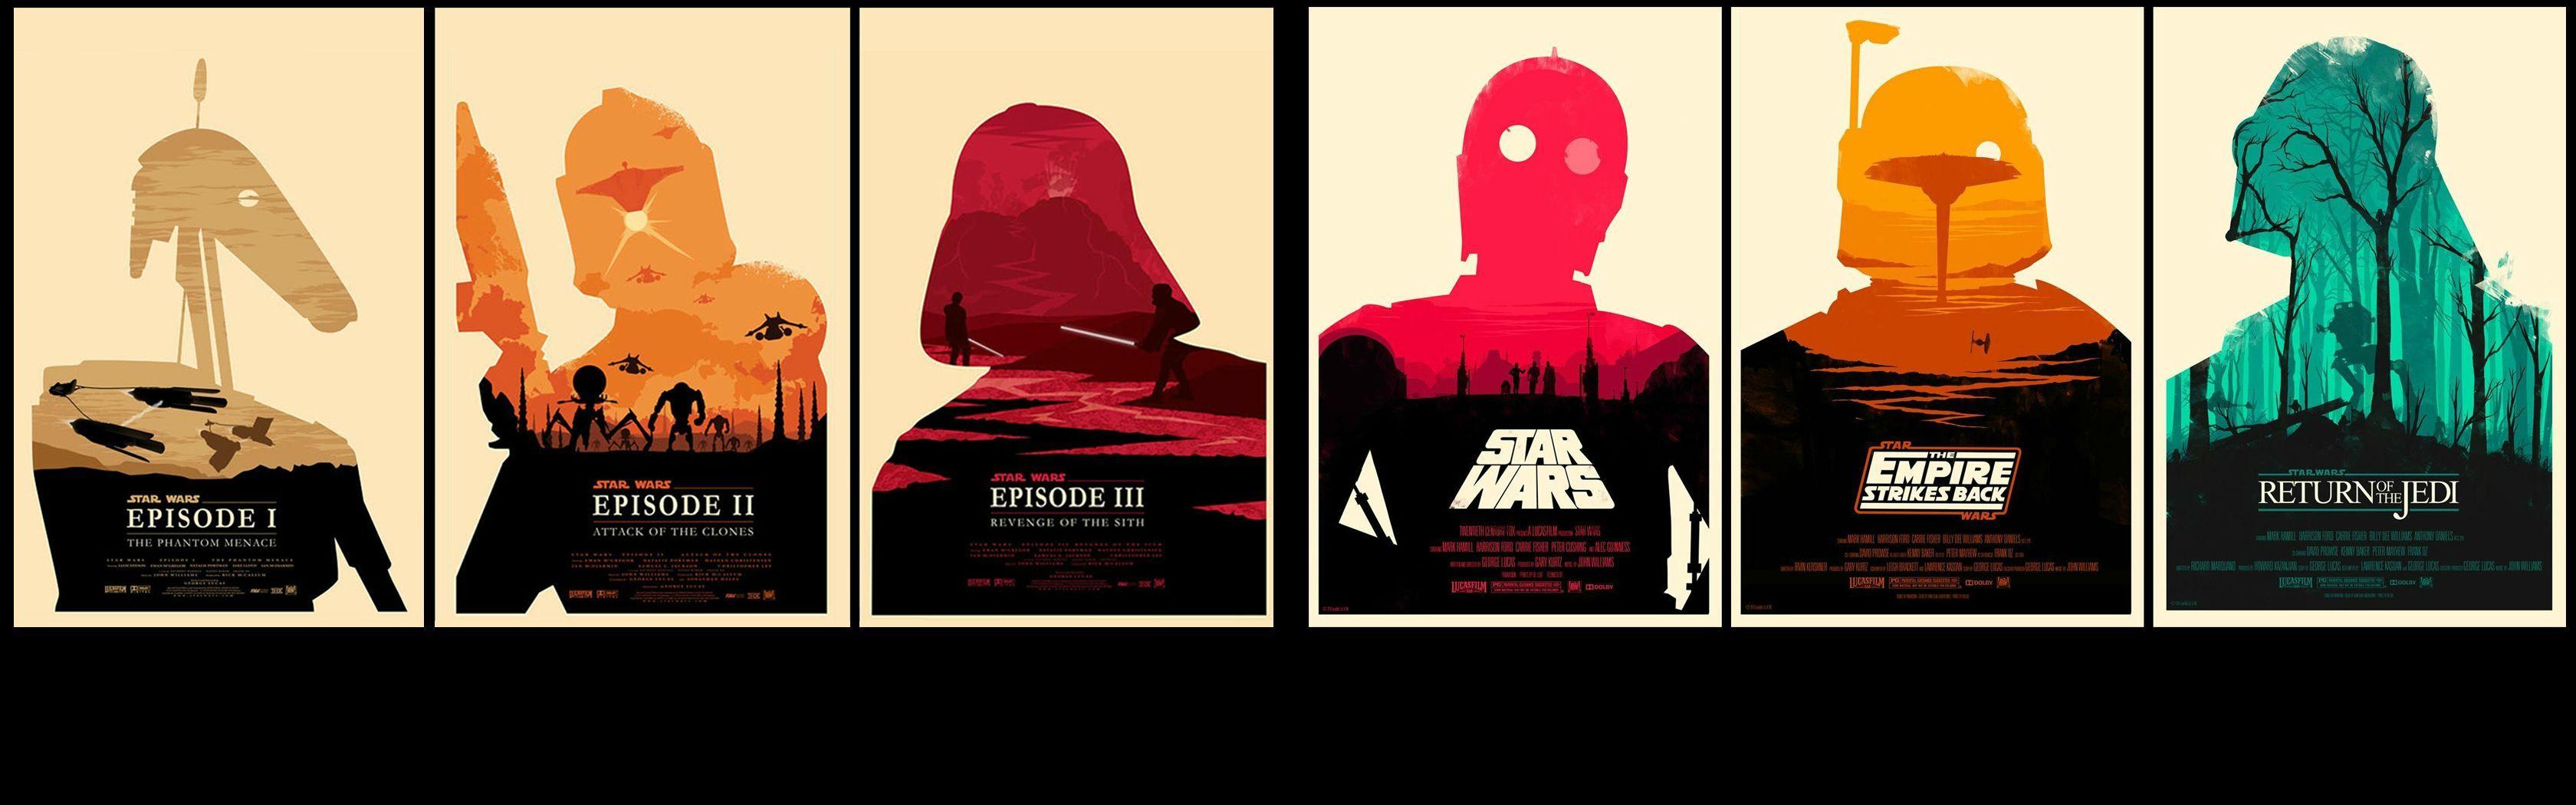 B7yit Jpg 3360 1050 Star Wars Poster Dual Screen Wallpaper Dual Monitor Wallpaper